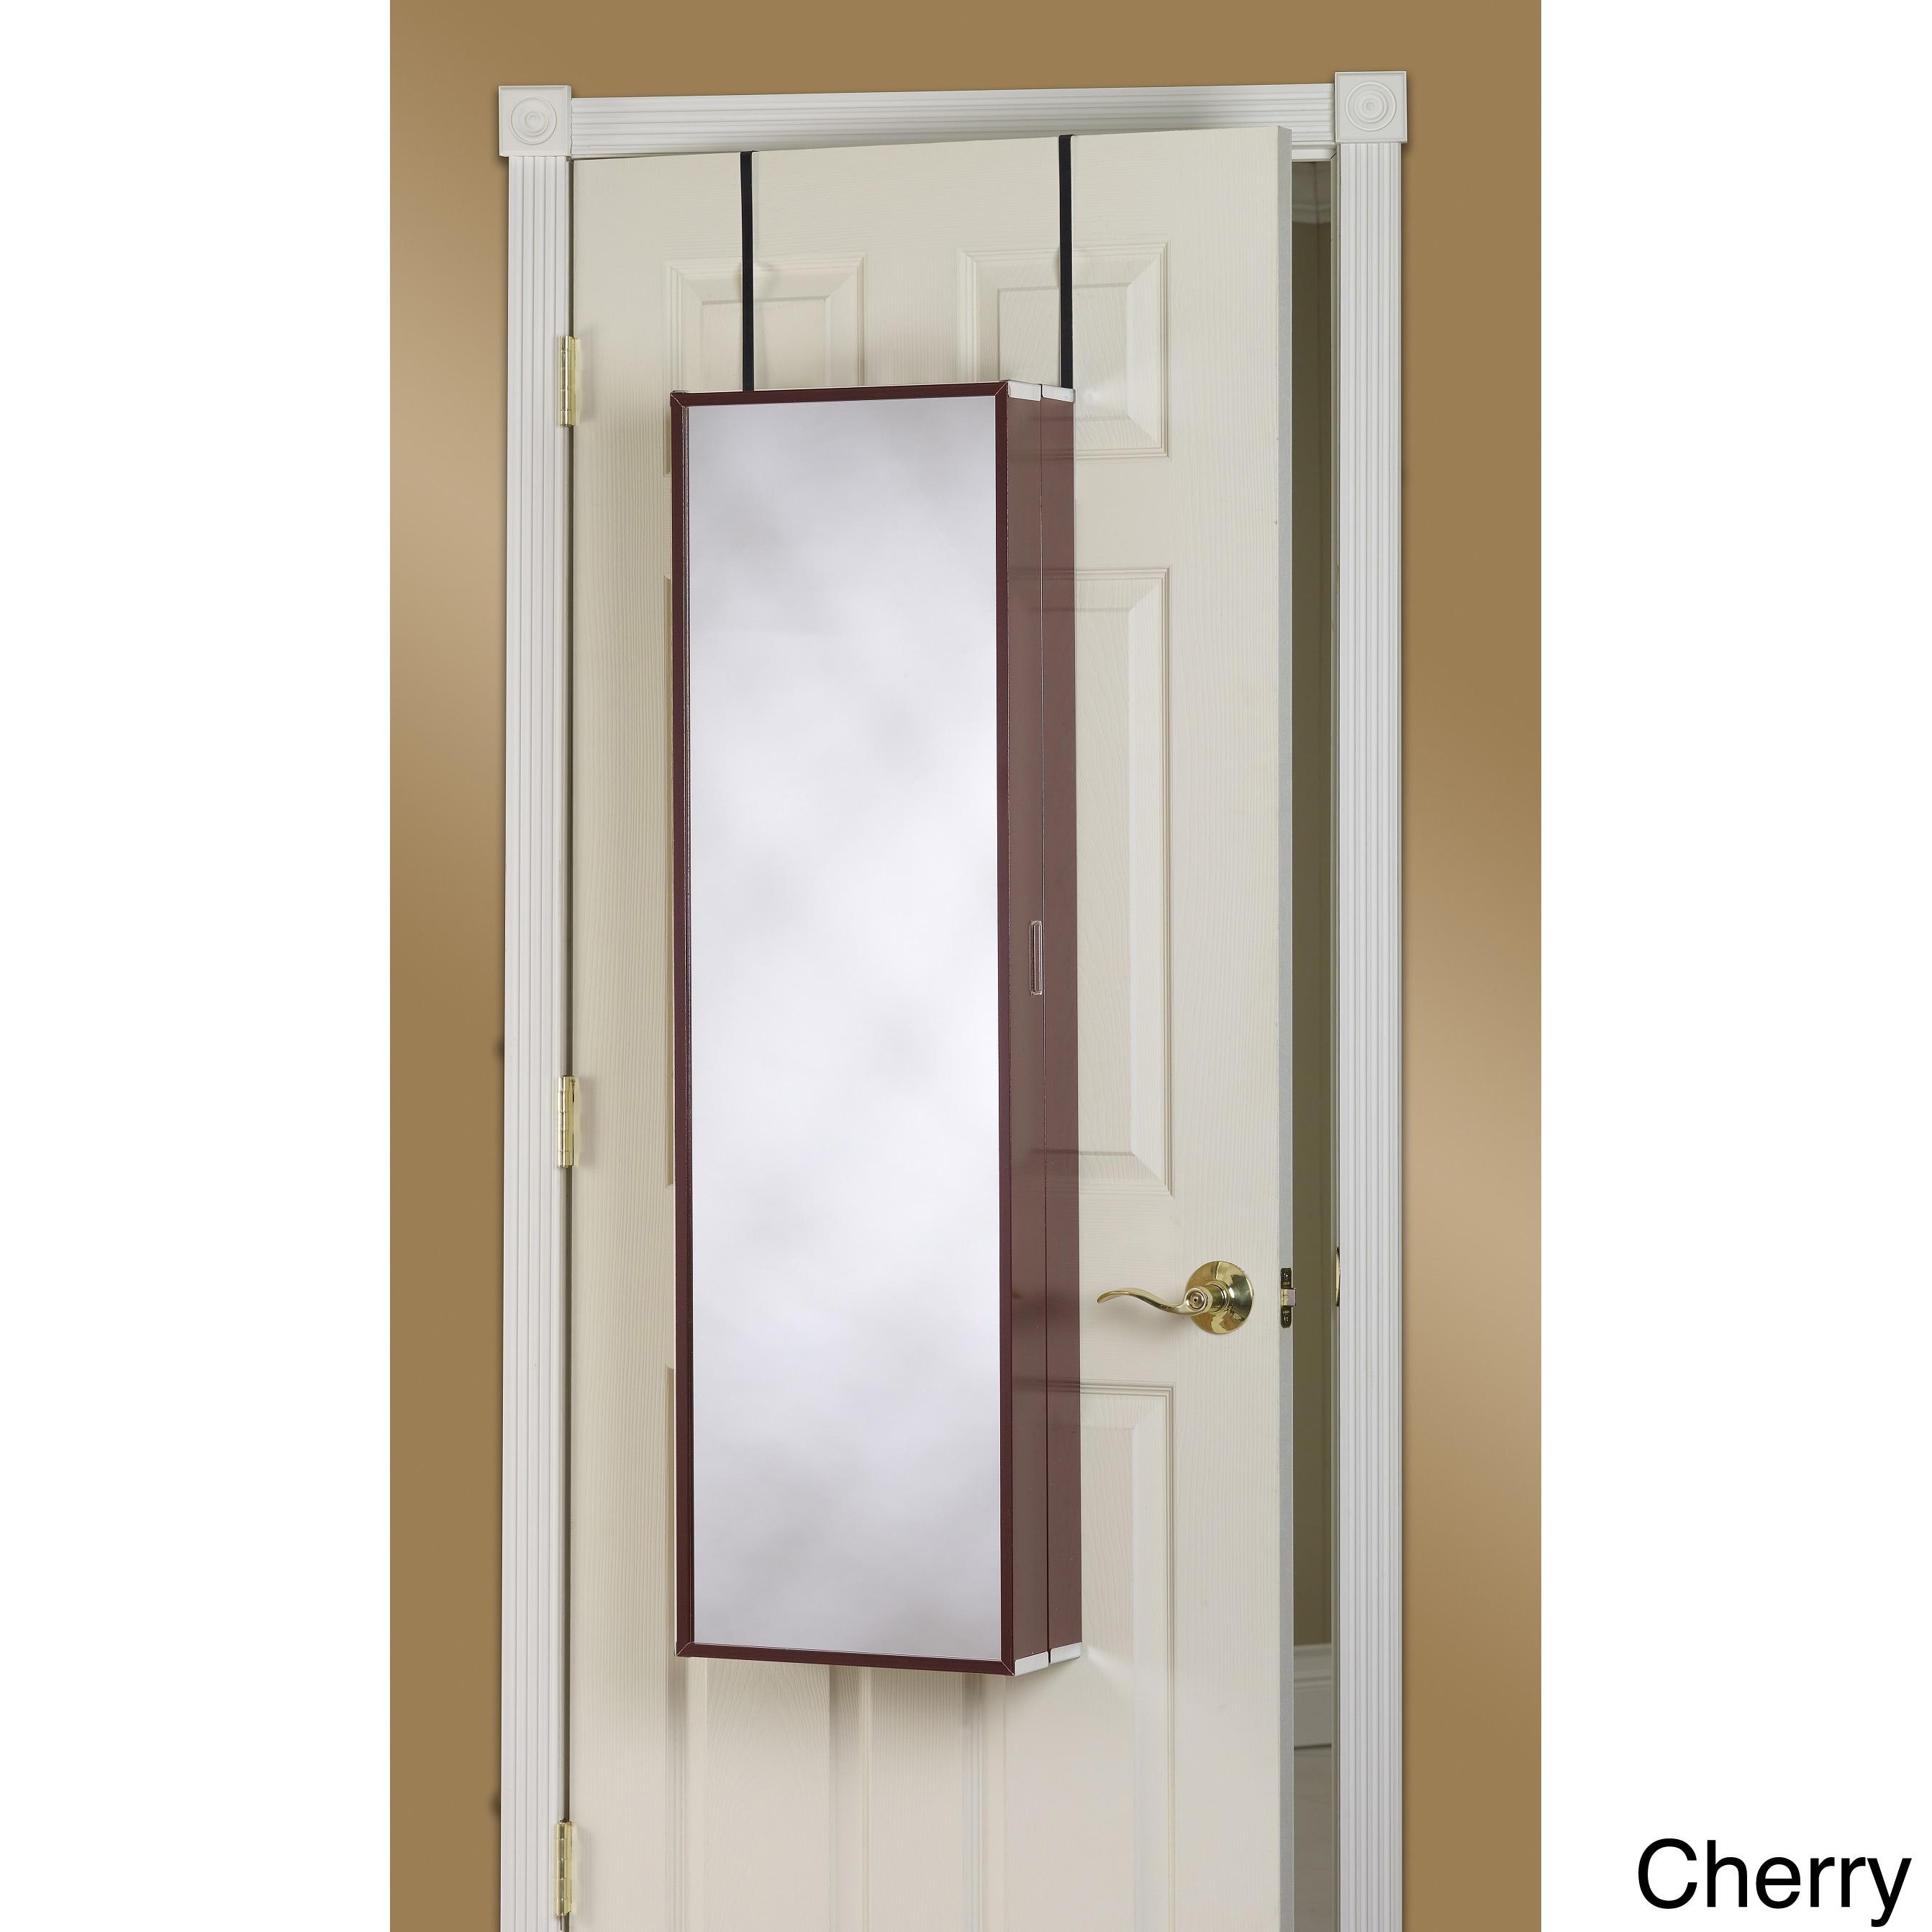 over the door mirror makeup vanity armoire overstock shopping great deals on mirrors. Black Bedroom Furniture Sets. Home Design Ideas